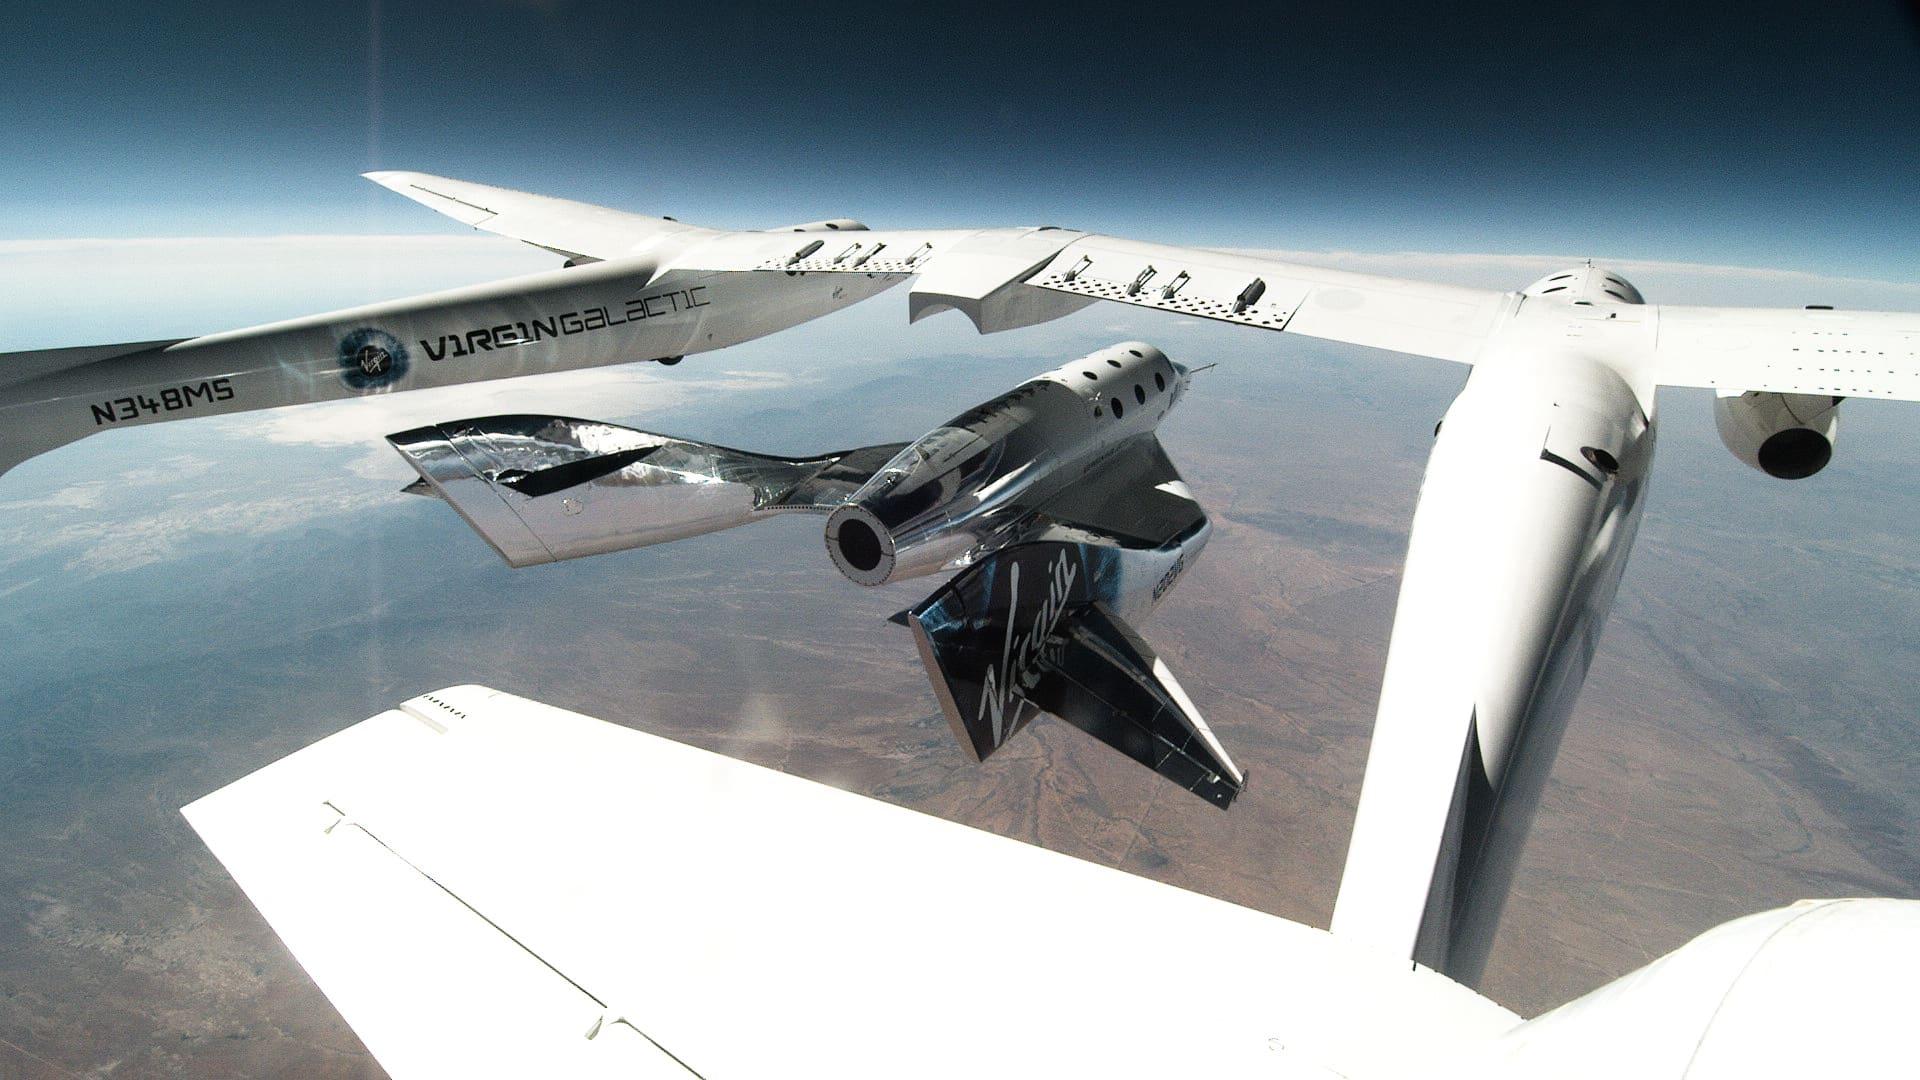 Virgin Galactic stops space travel effort in New Mexico